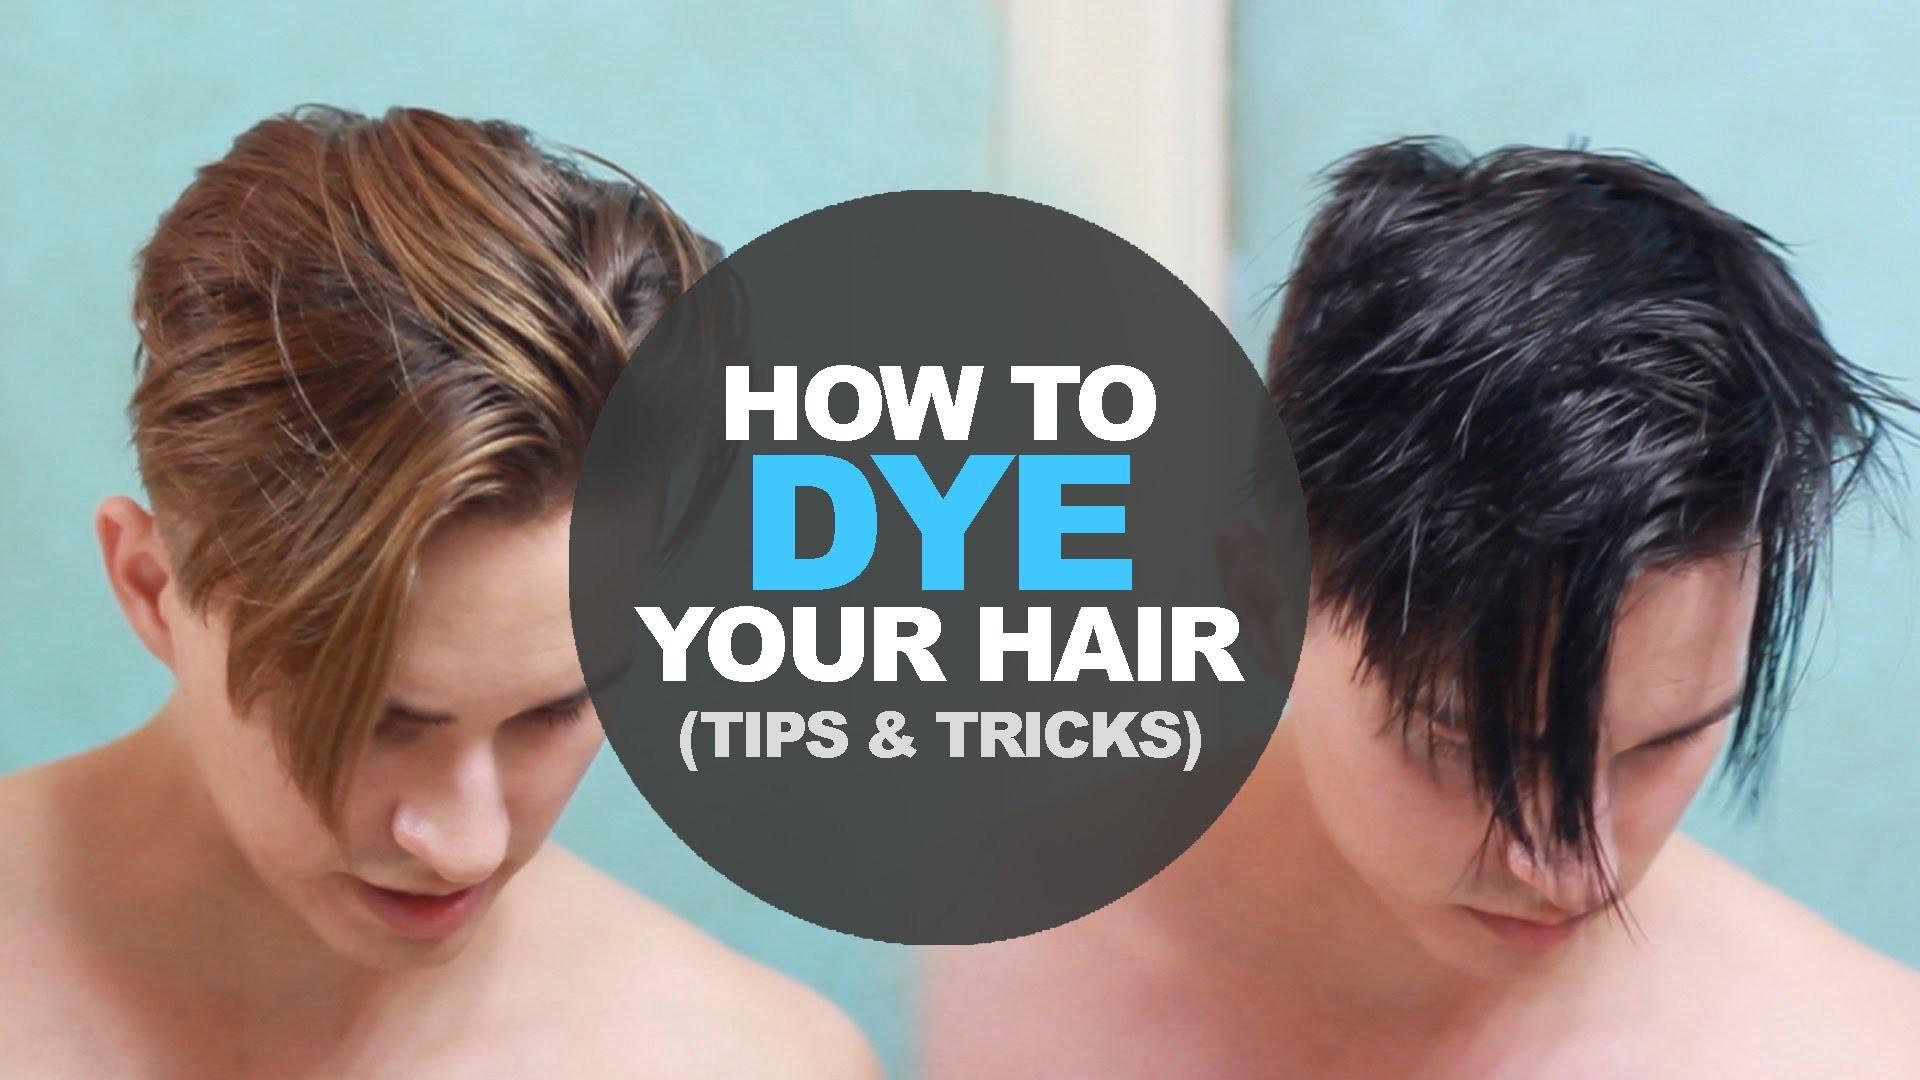 How to Dye Men's Hair at home | DIY | Men's Hairstyle tutorial